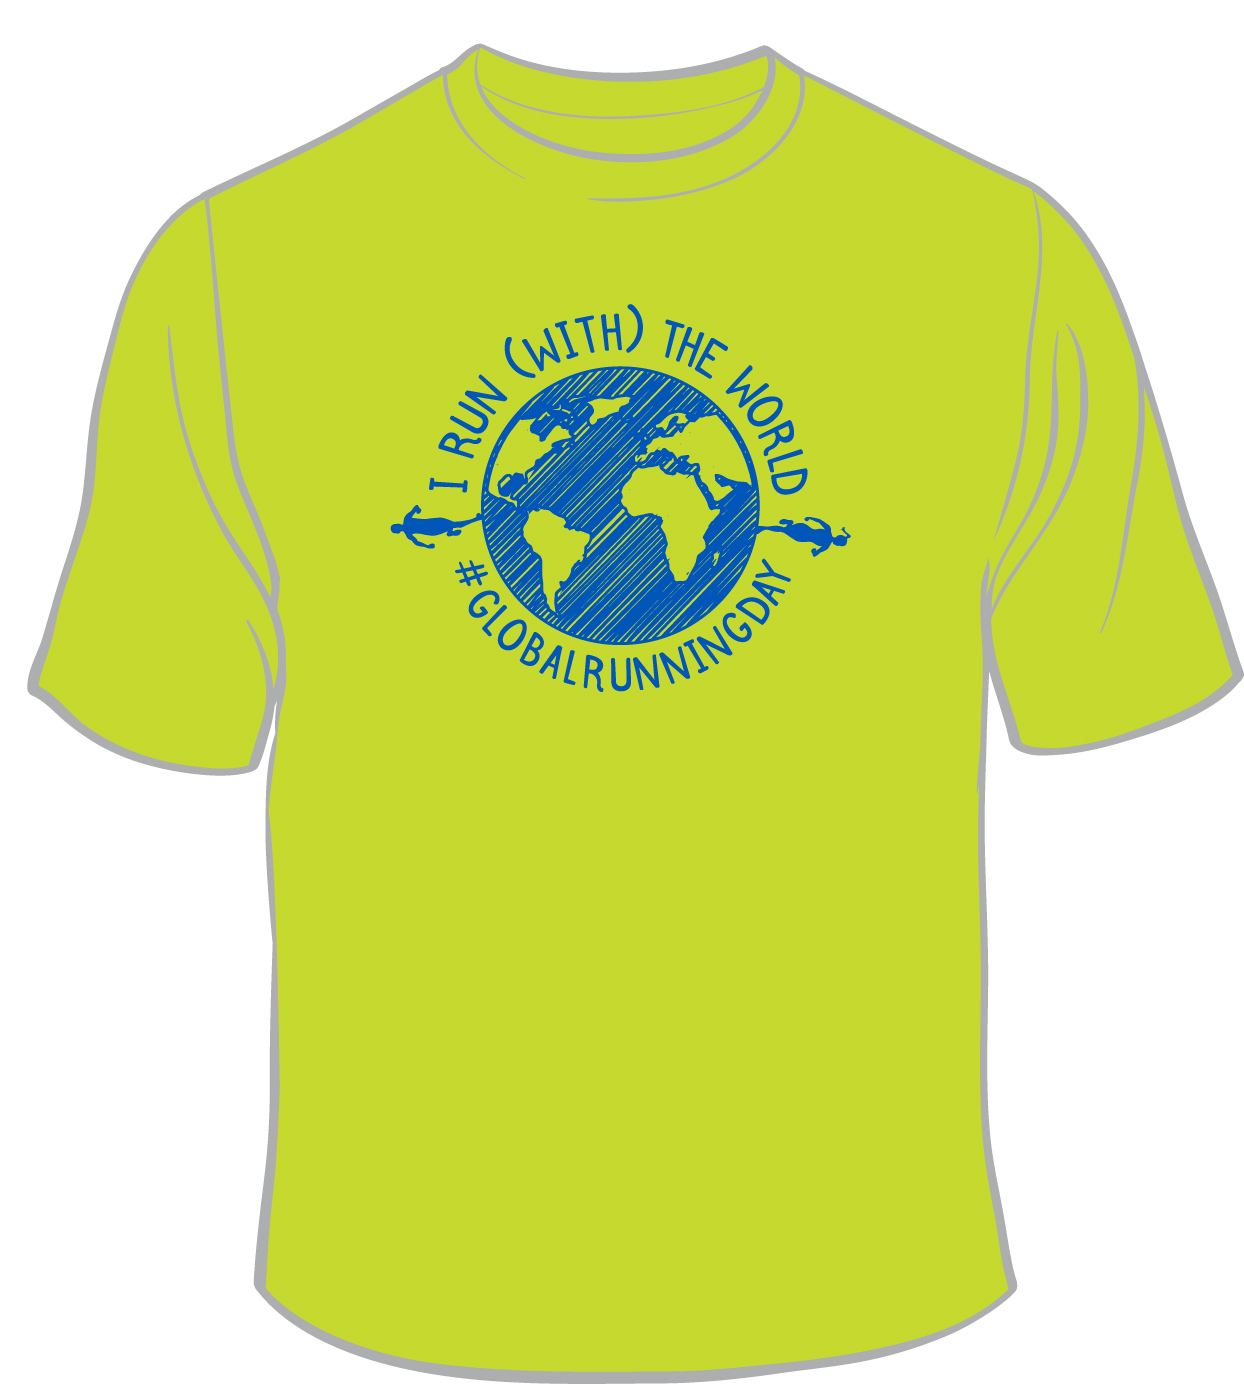 Global Running Day Tee